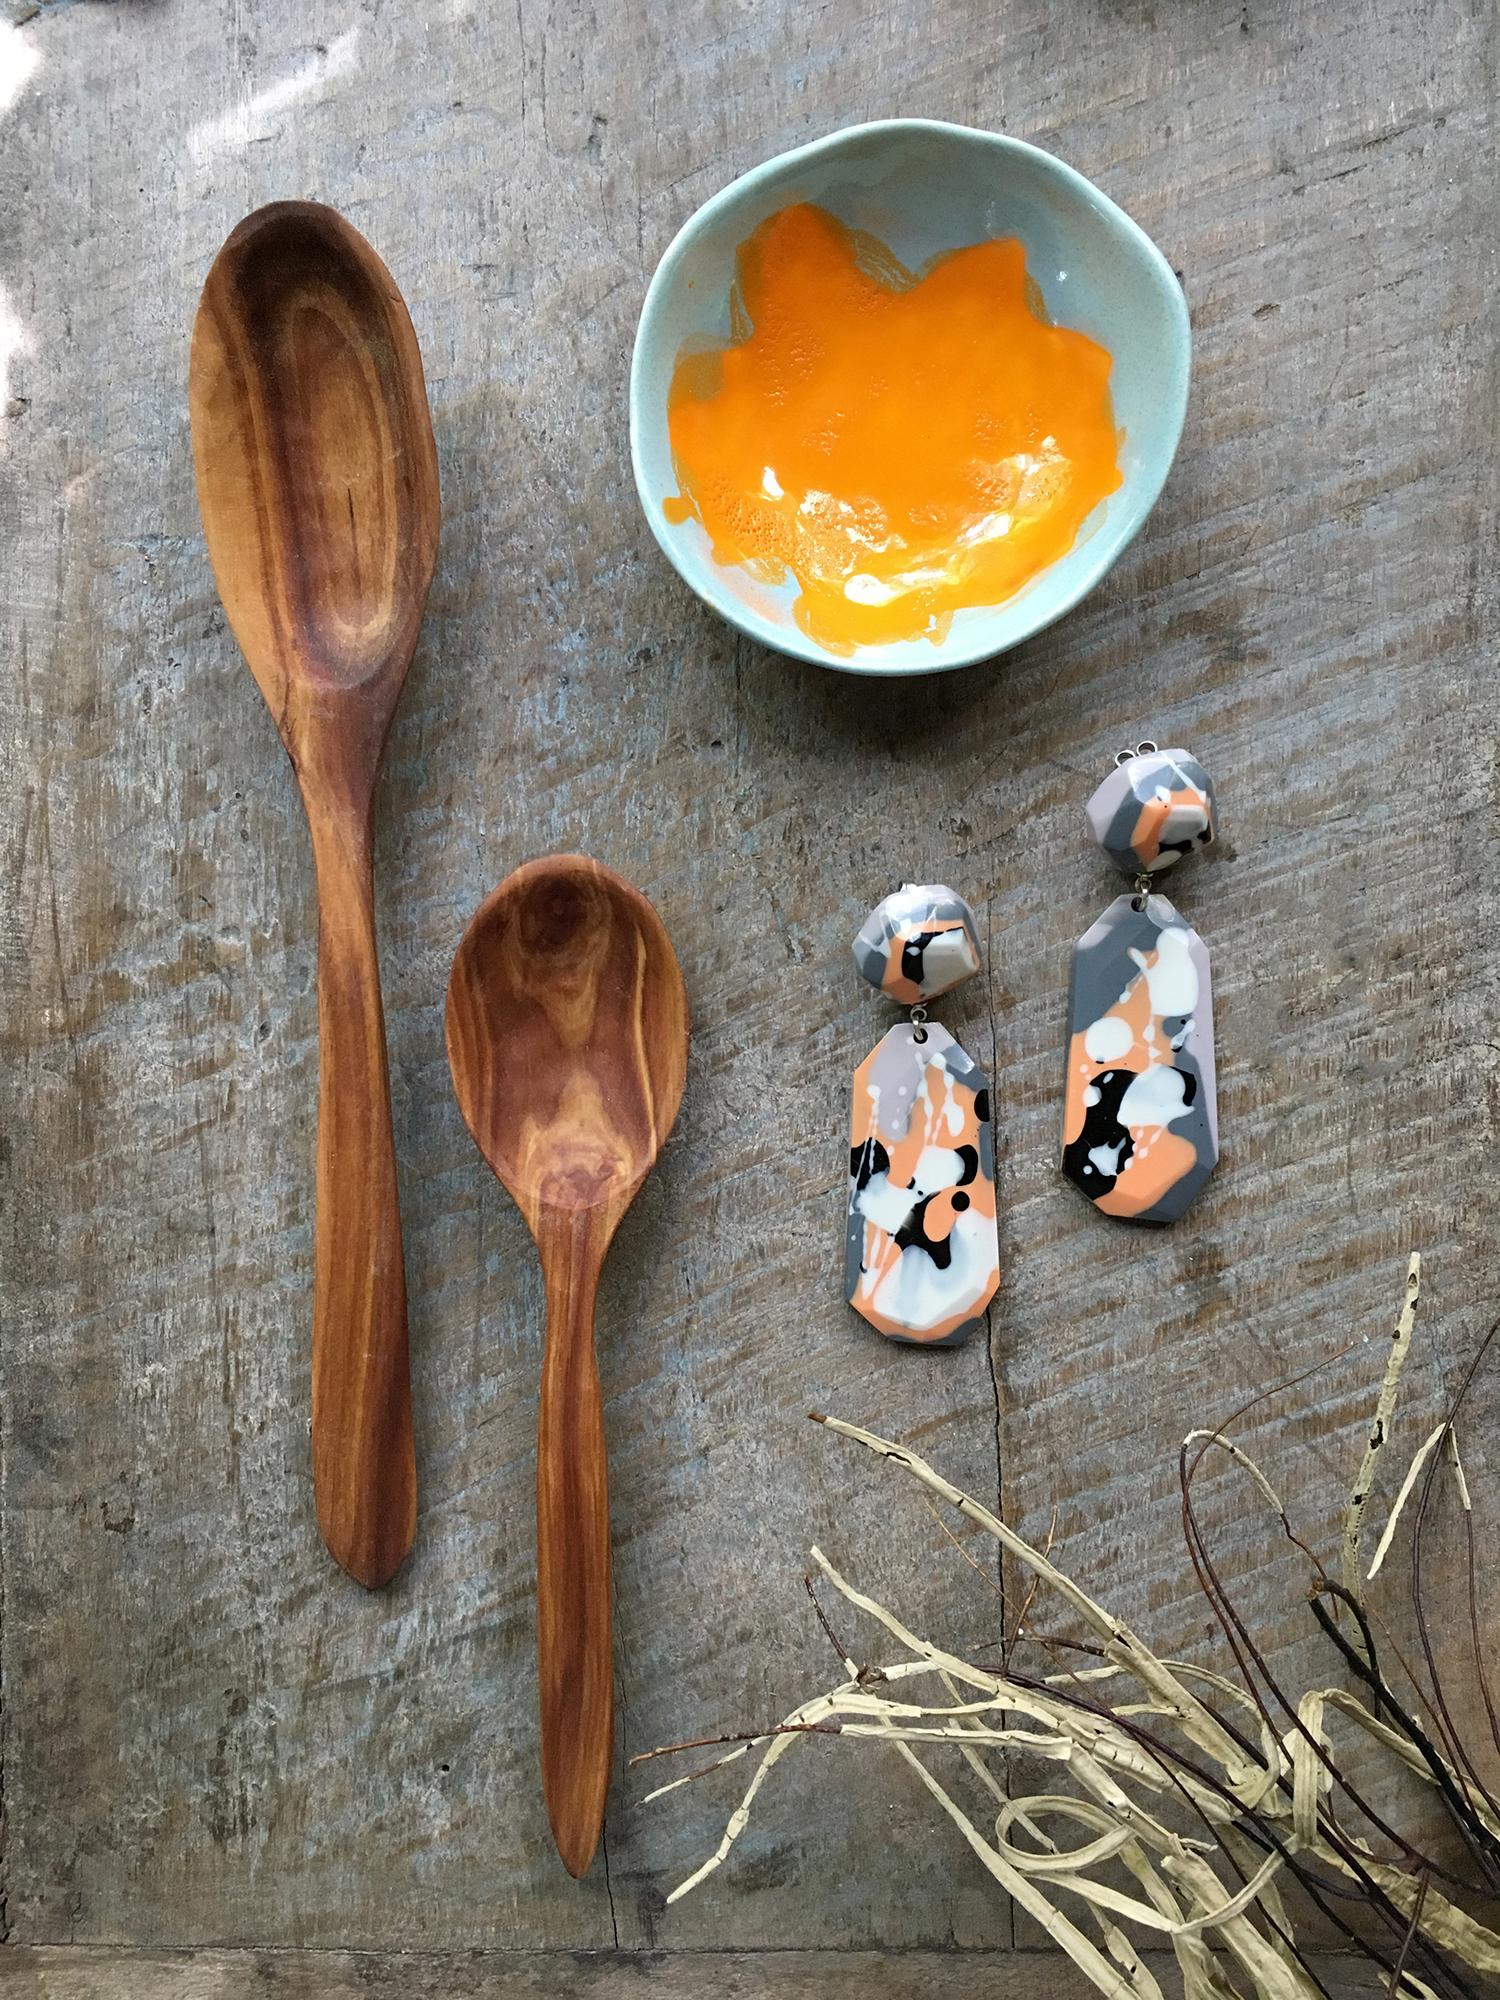 timber utensils -elk craft / resin earrings -flock curiosity assembly / ceramic dish -elnaz nourizadeh